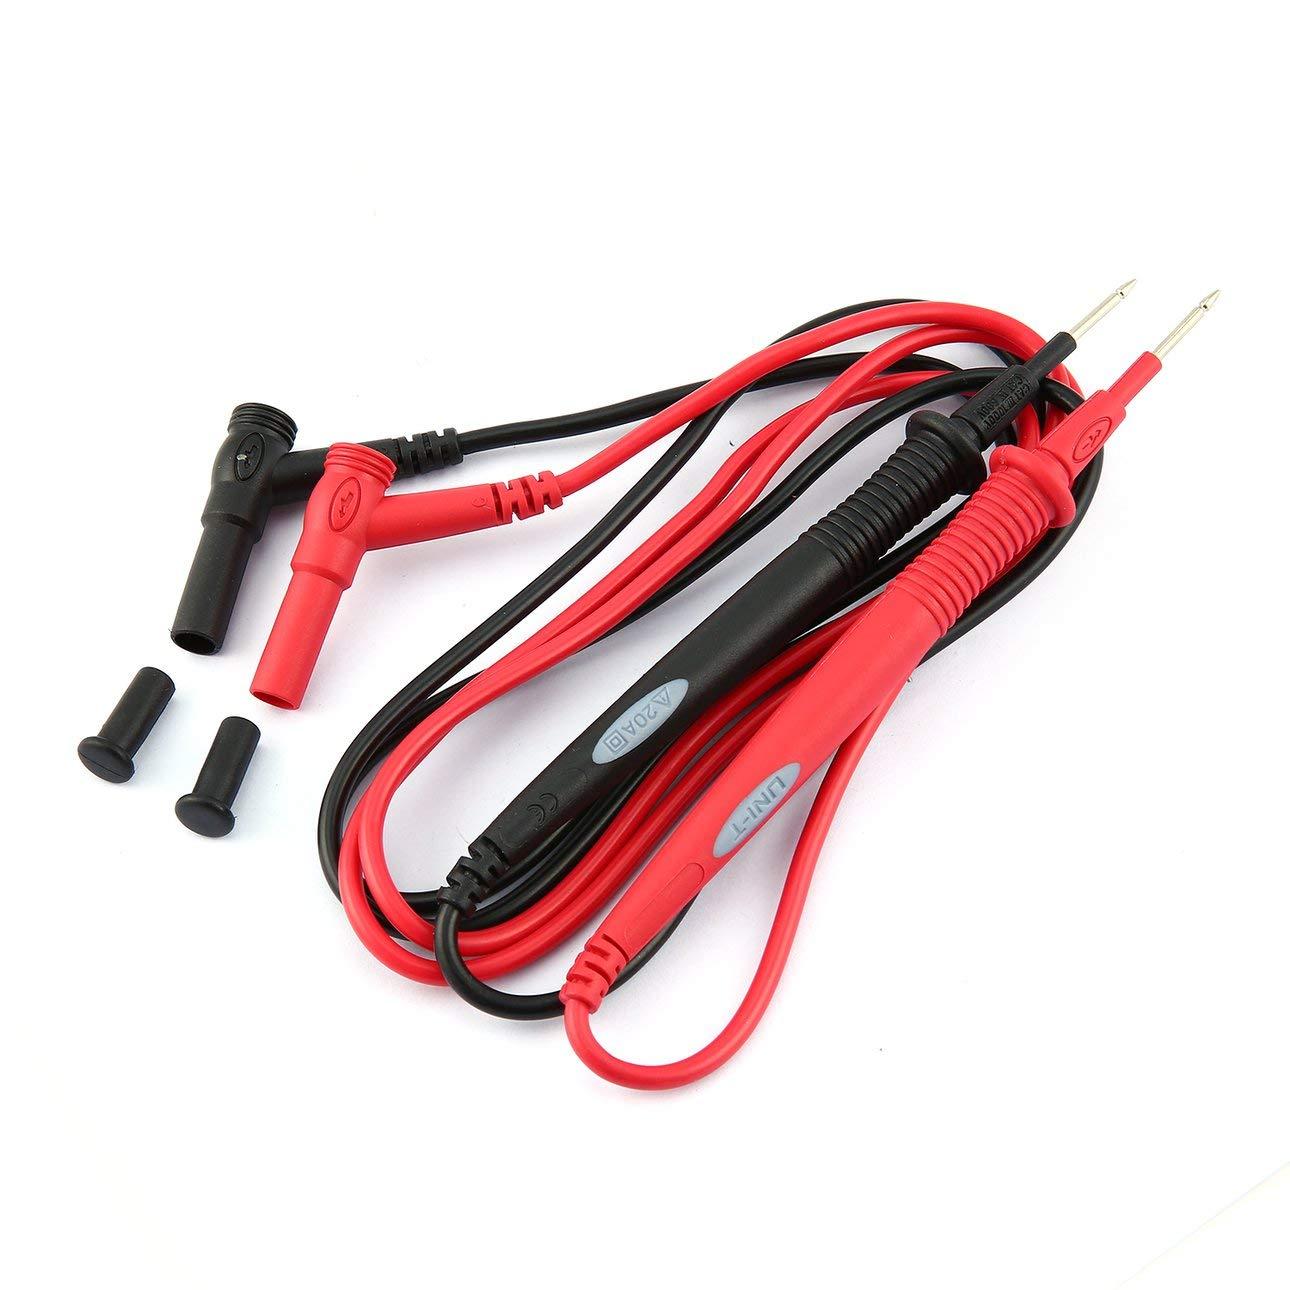 UNI-T Sonde per test universali Pin Pin Digital Multimeter Needle Tip Tester of Ballylelly